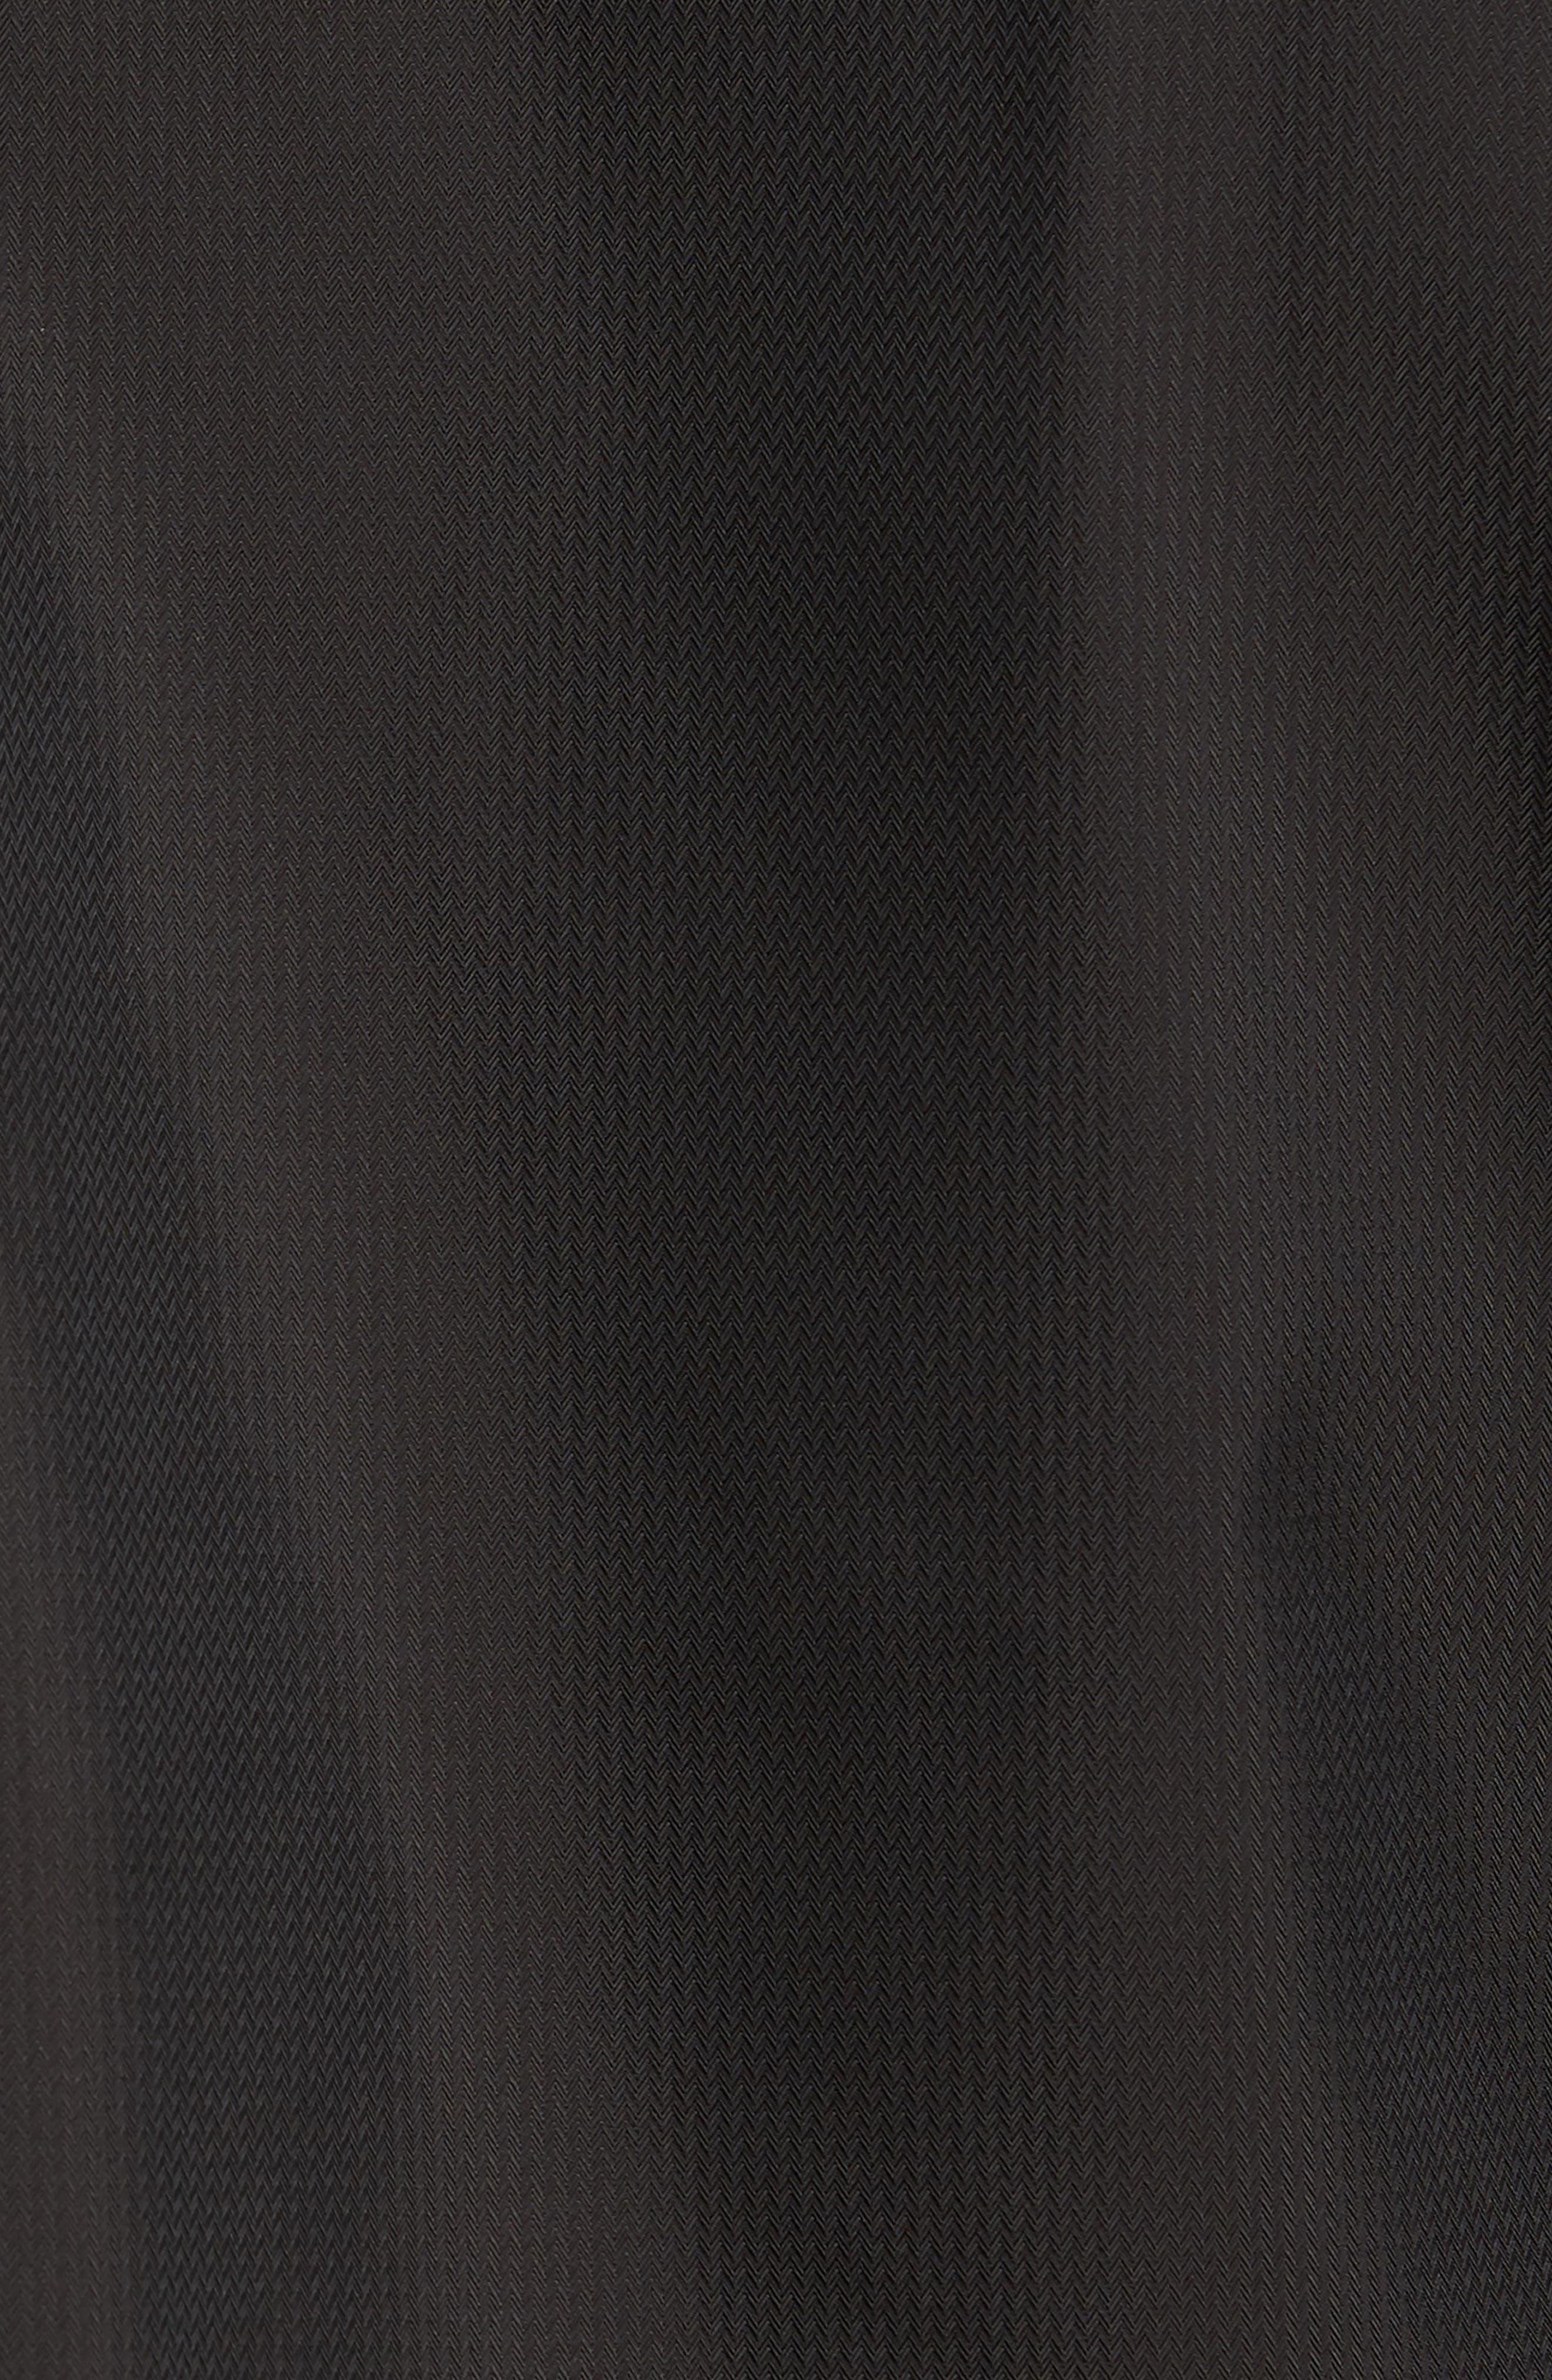 Calgar Nylon Bomber Jacket,                             Alternate thumbnail 5, color,                             Black